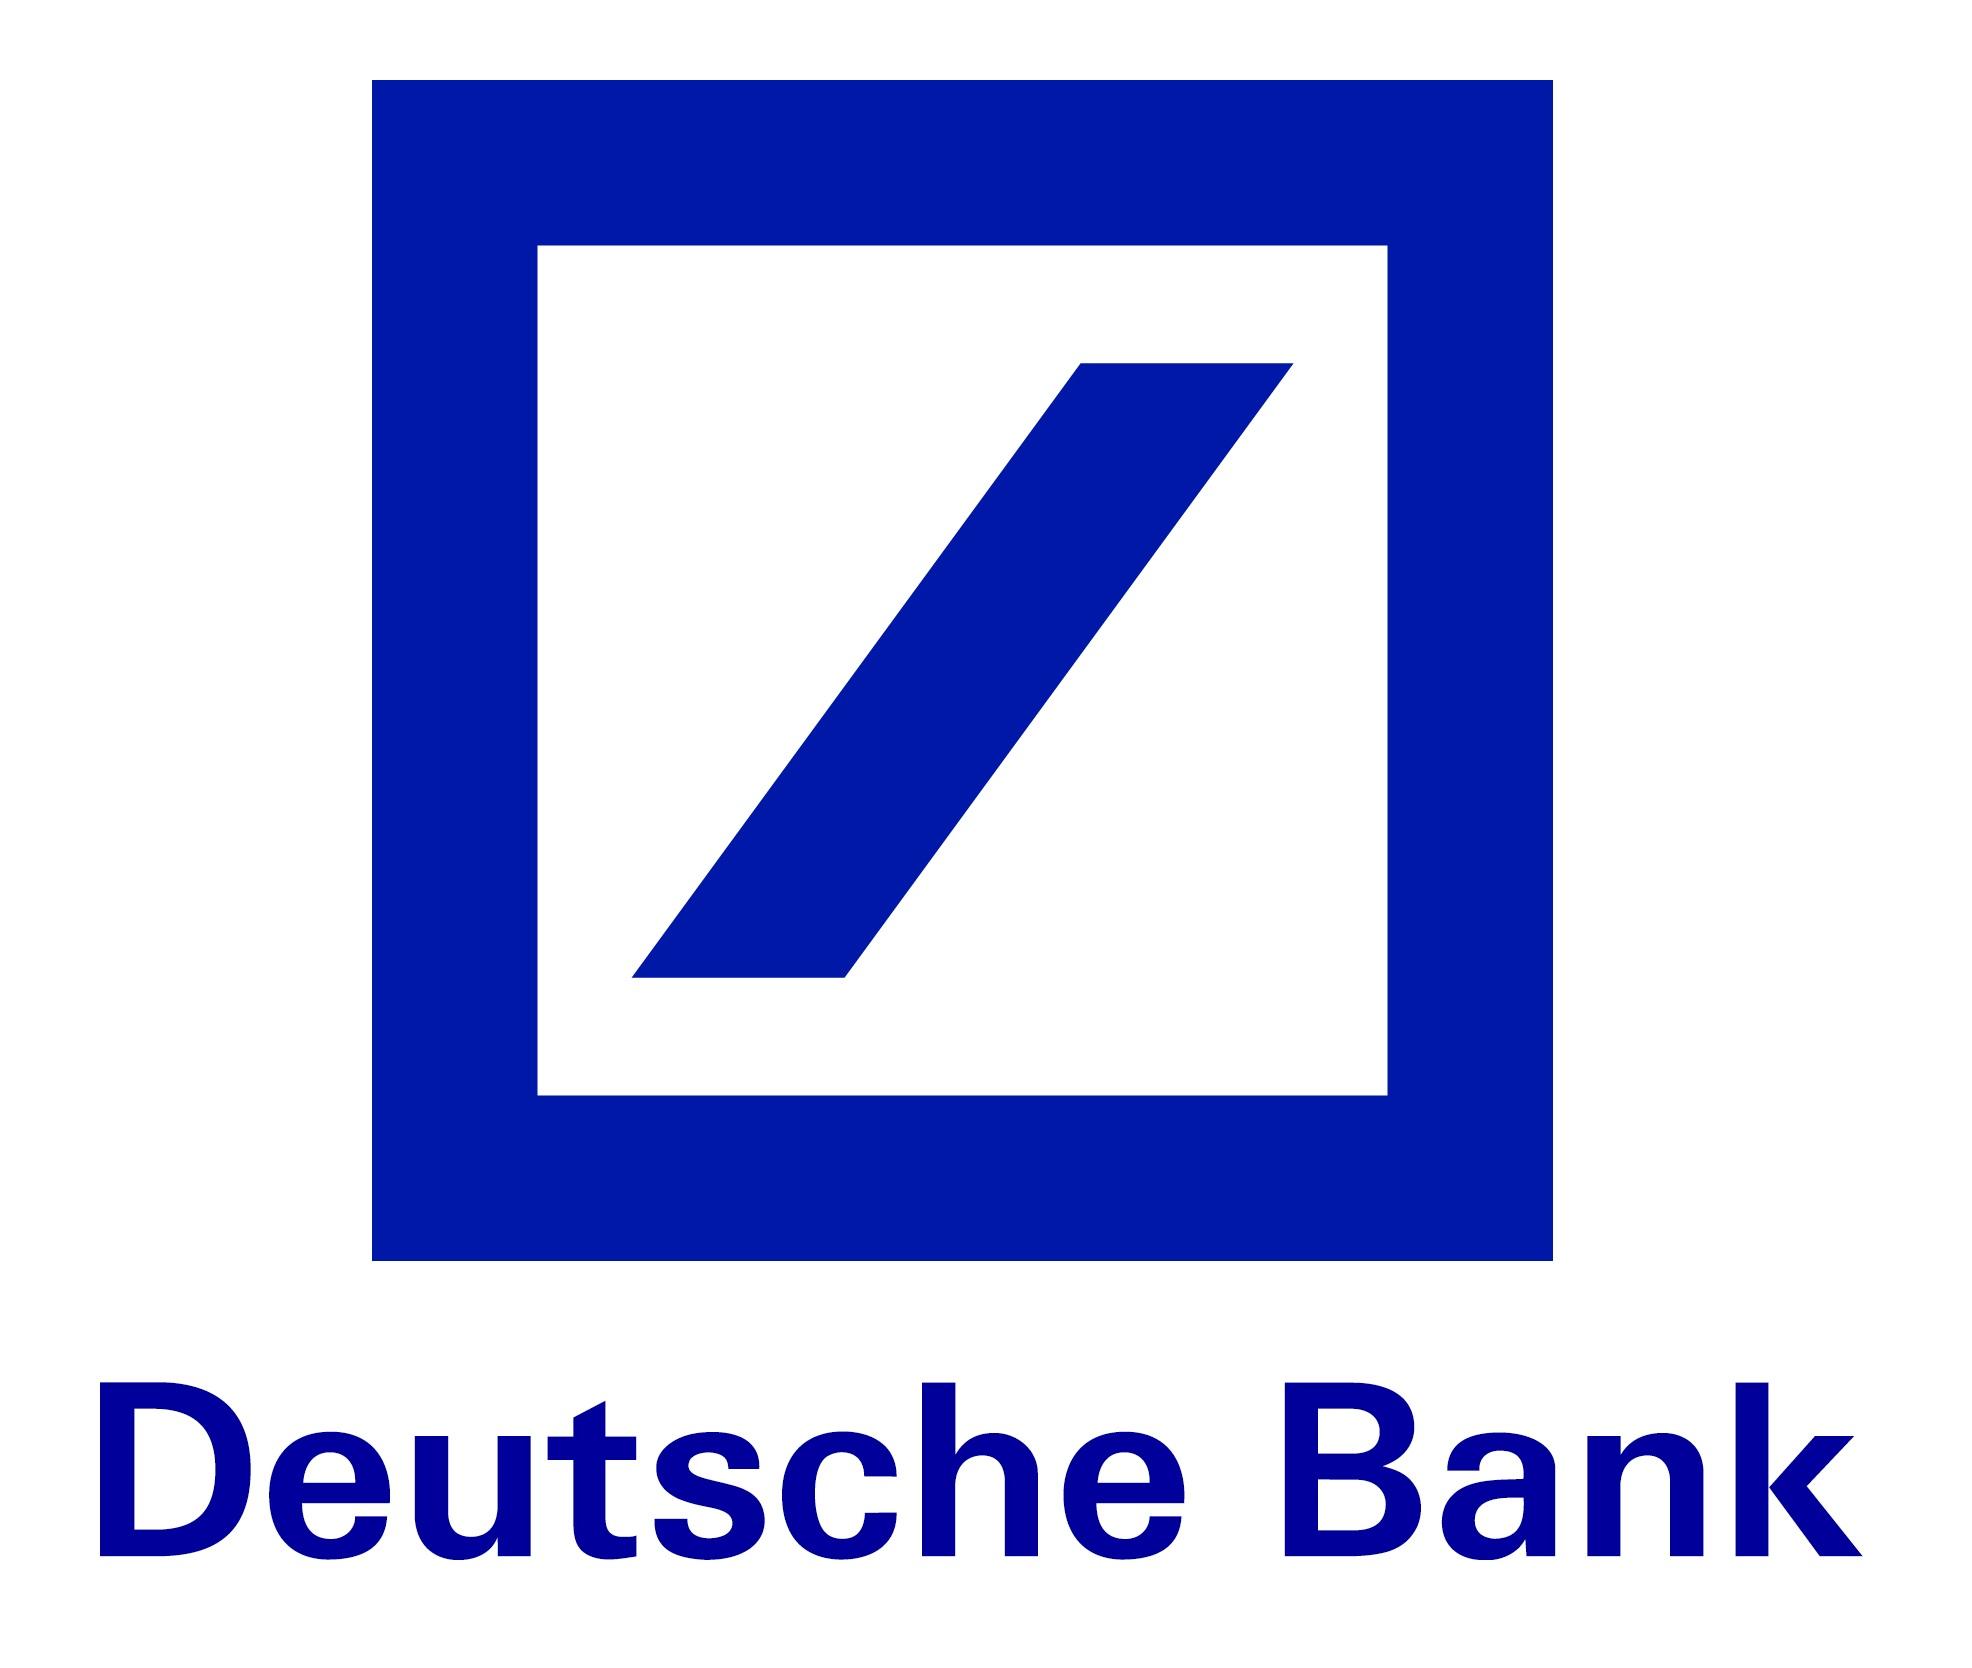 DEUTSCHE BANK Reviews, Employee Reviews, Careers, Recruitment, Jobs